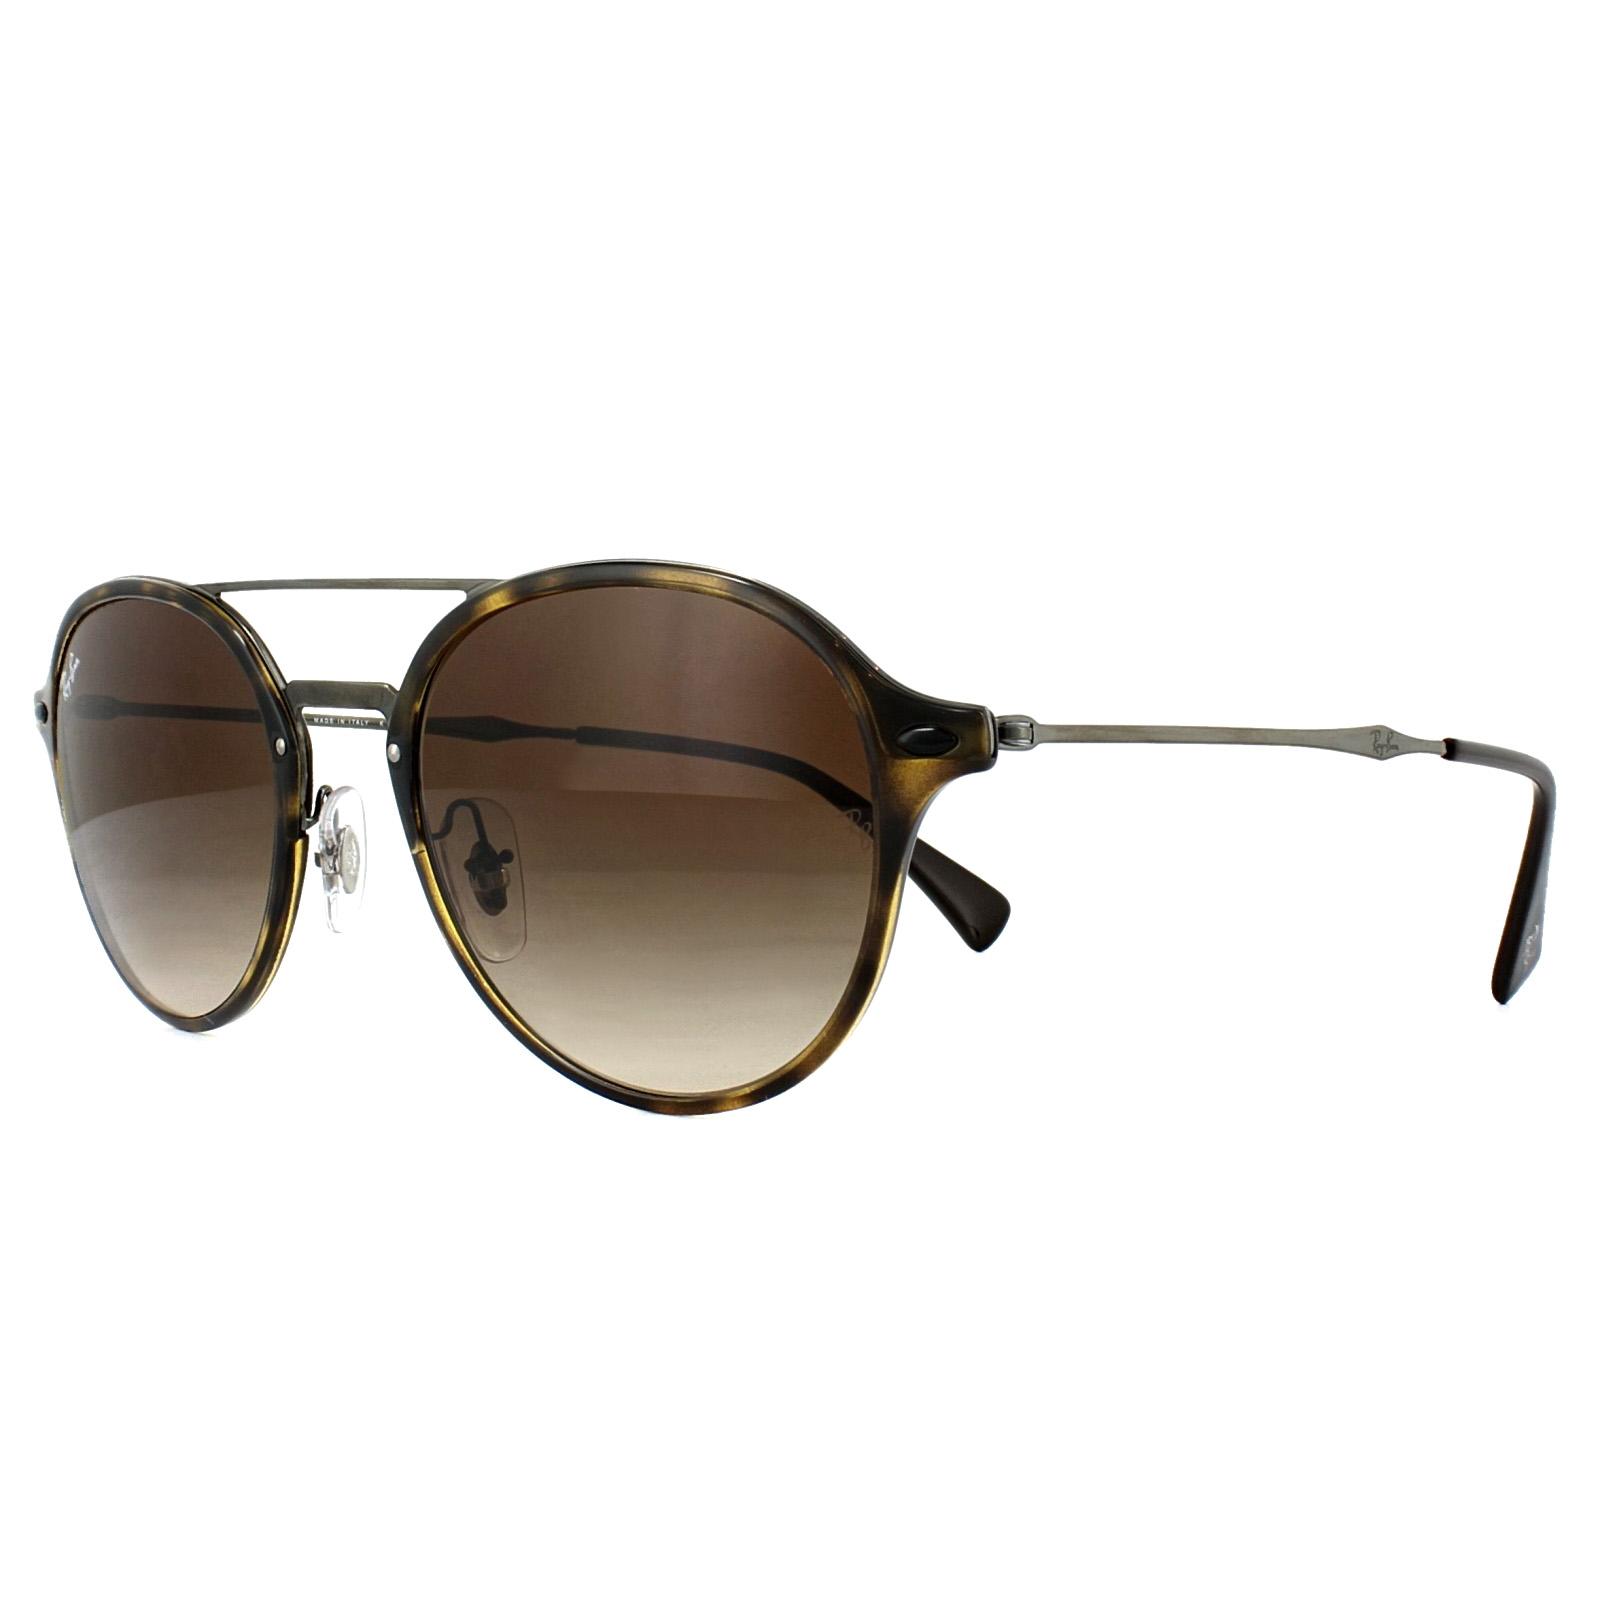 5e0c8c5e09 Sentinel Ray-Ban Sunglasses 4287 710 13 Tortoise Gunmetal Brown Gradient